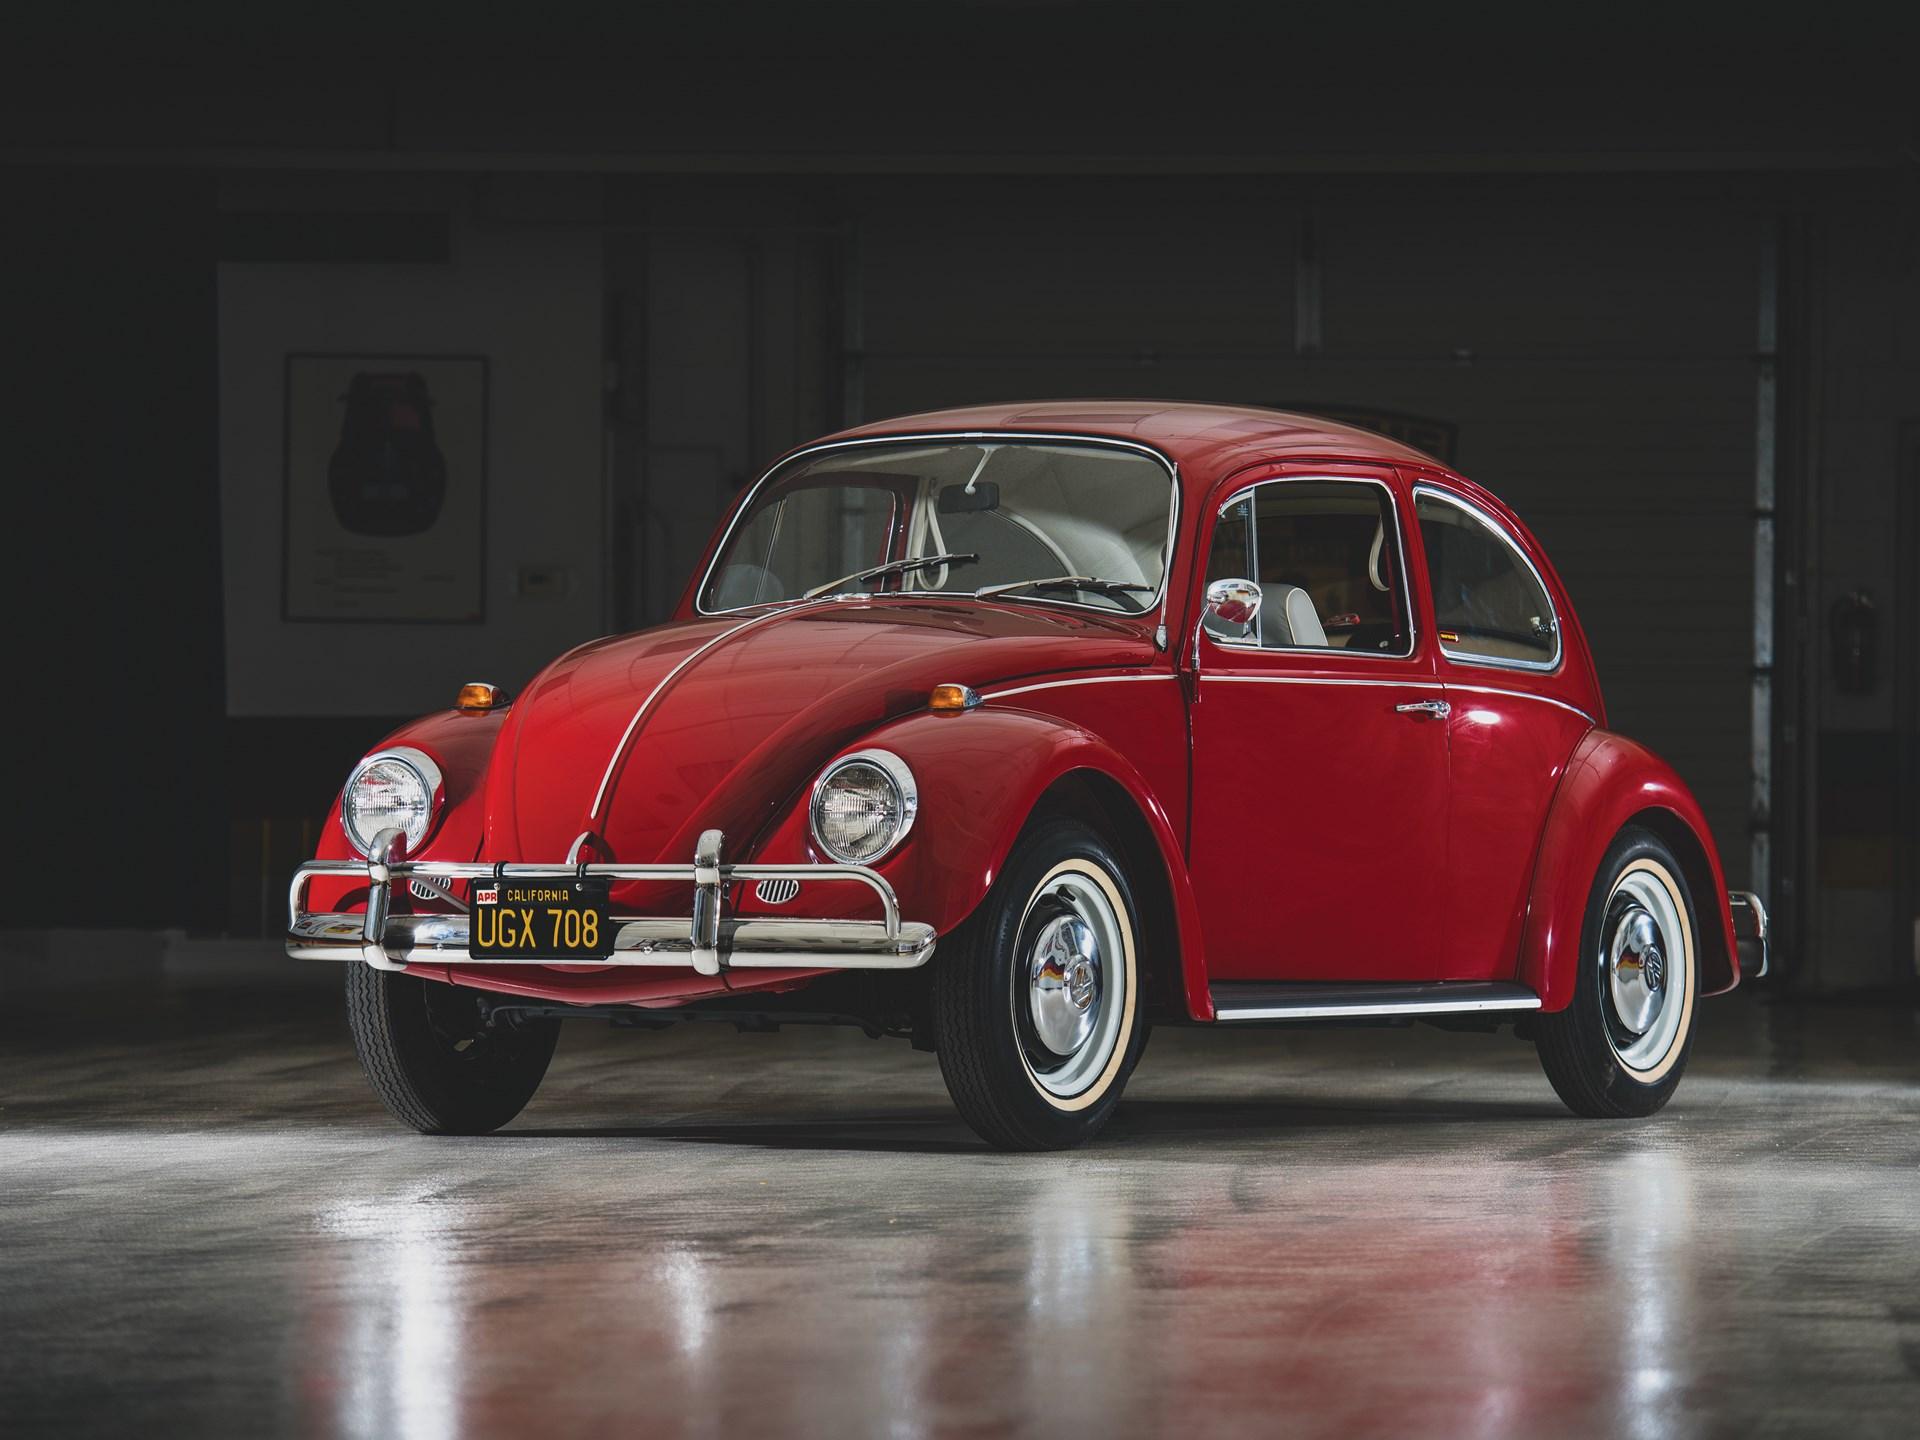 Image result for rm taj ma garaj super beetle